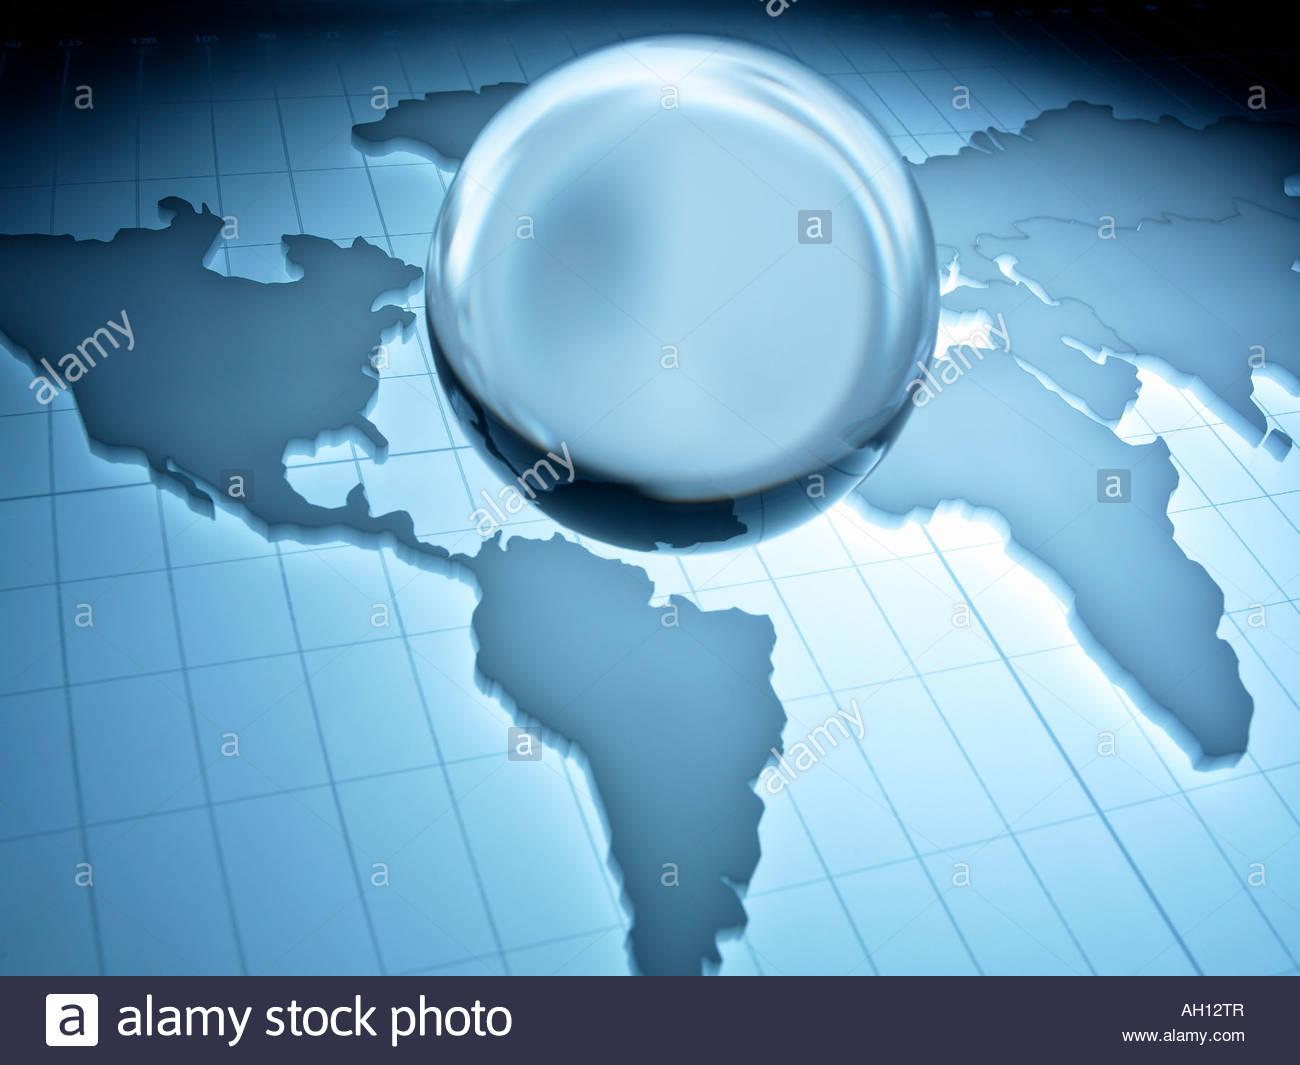 Map of world with stylized globe - Stock Image